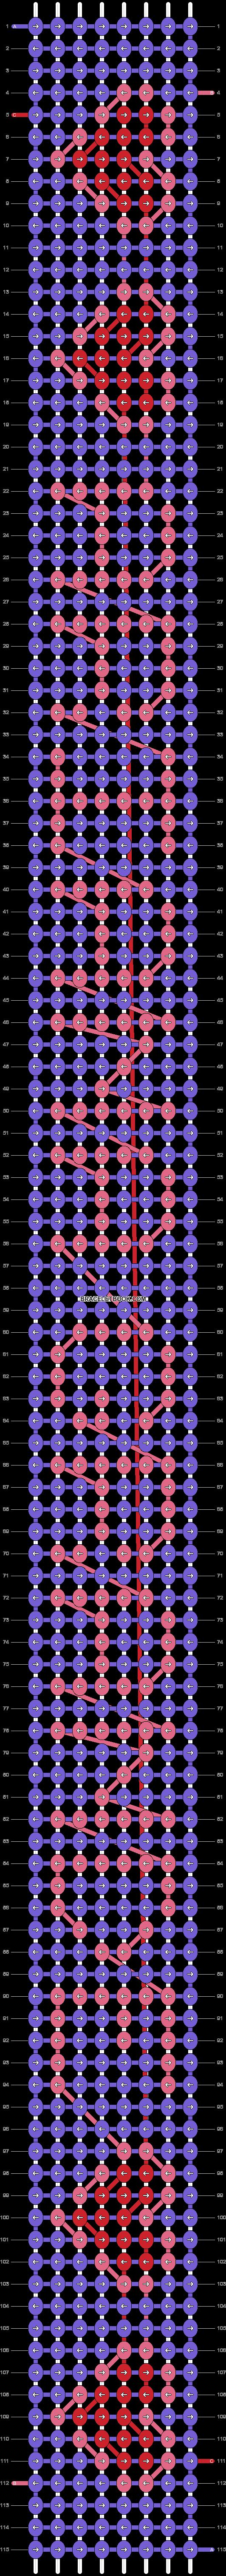 Alpha pattern #2971 pattern